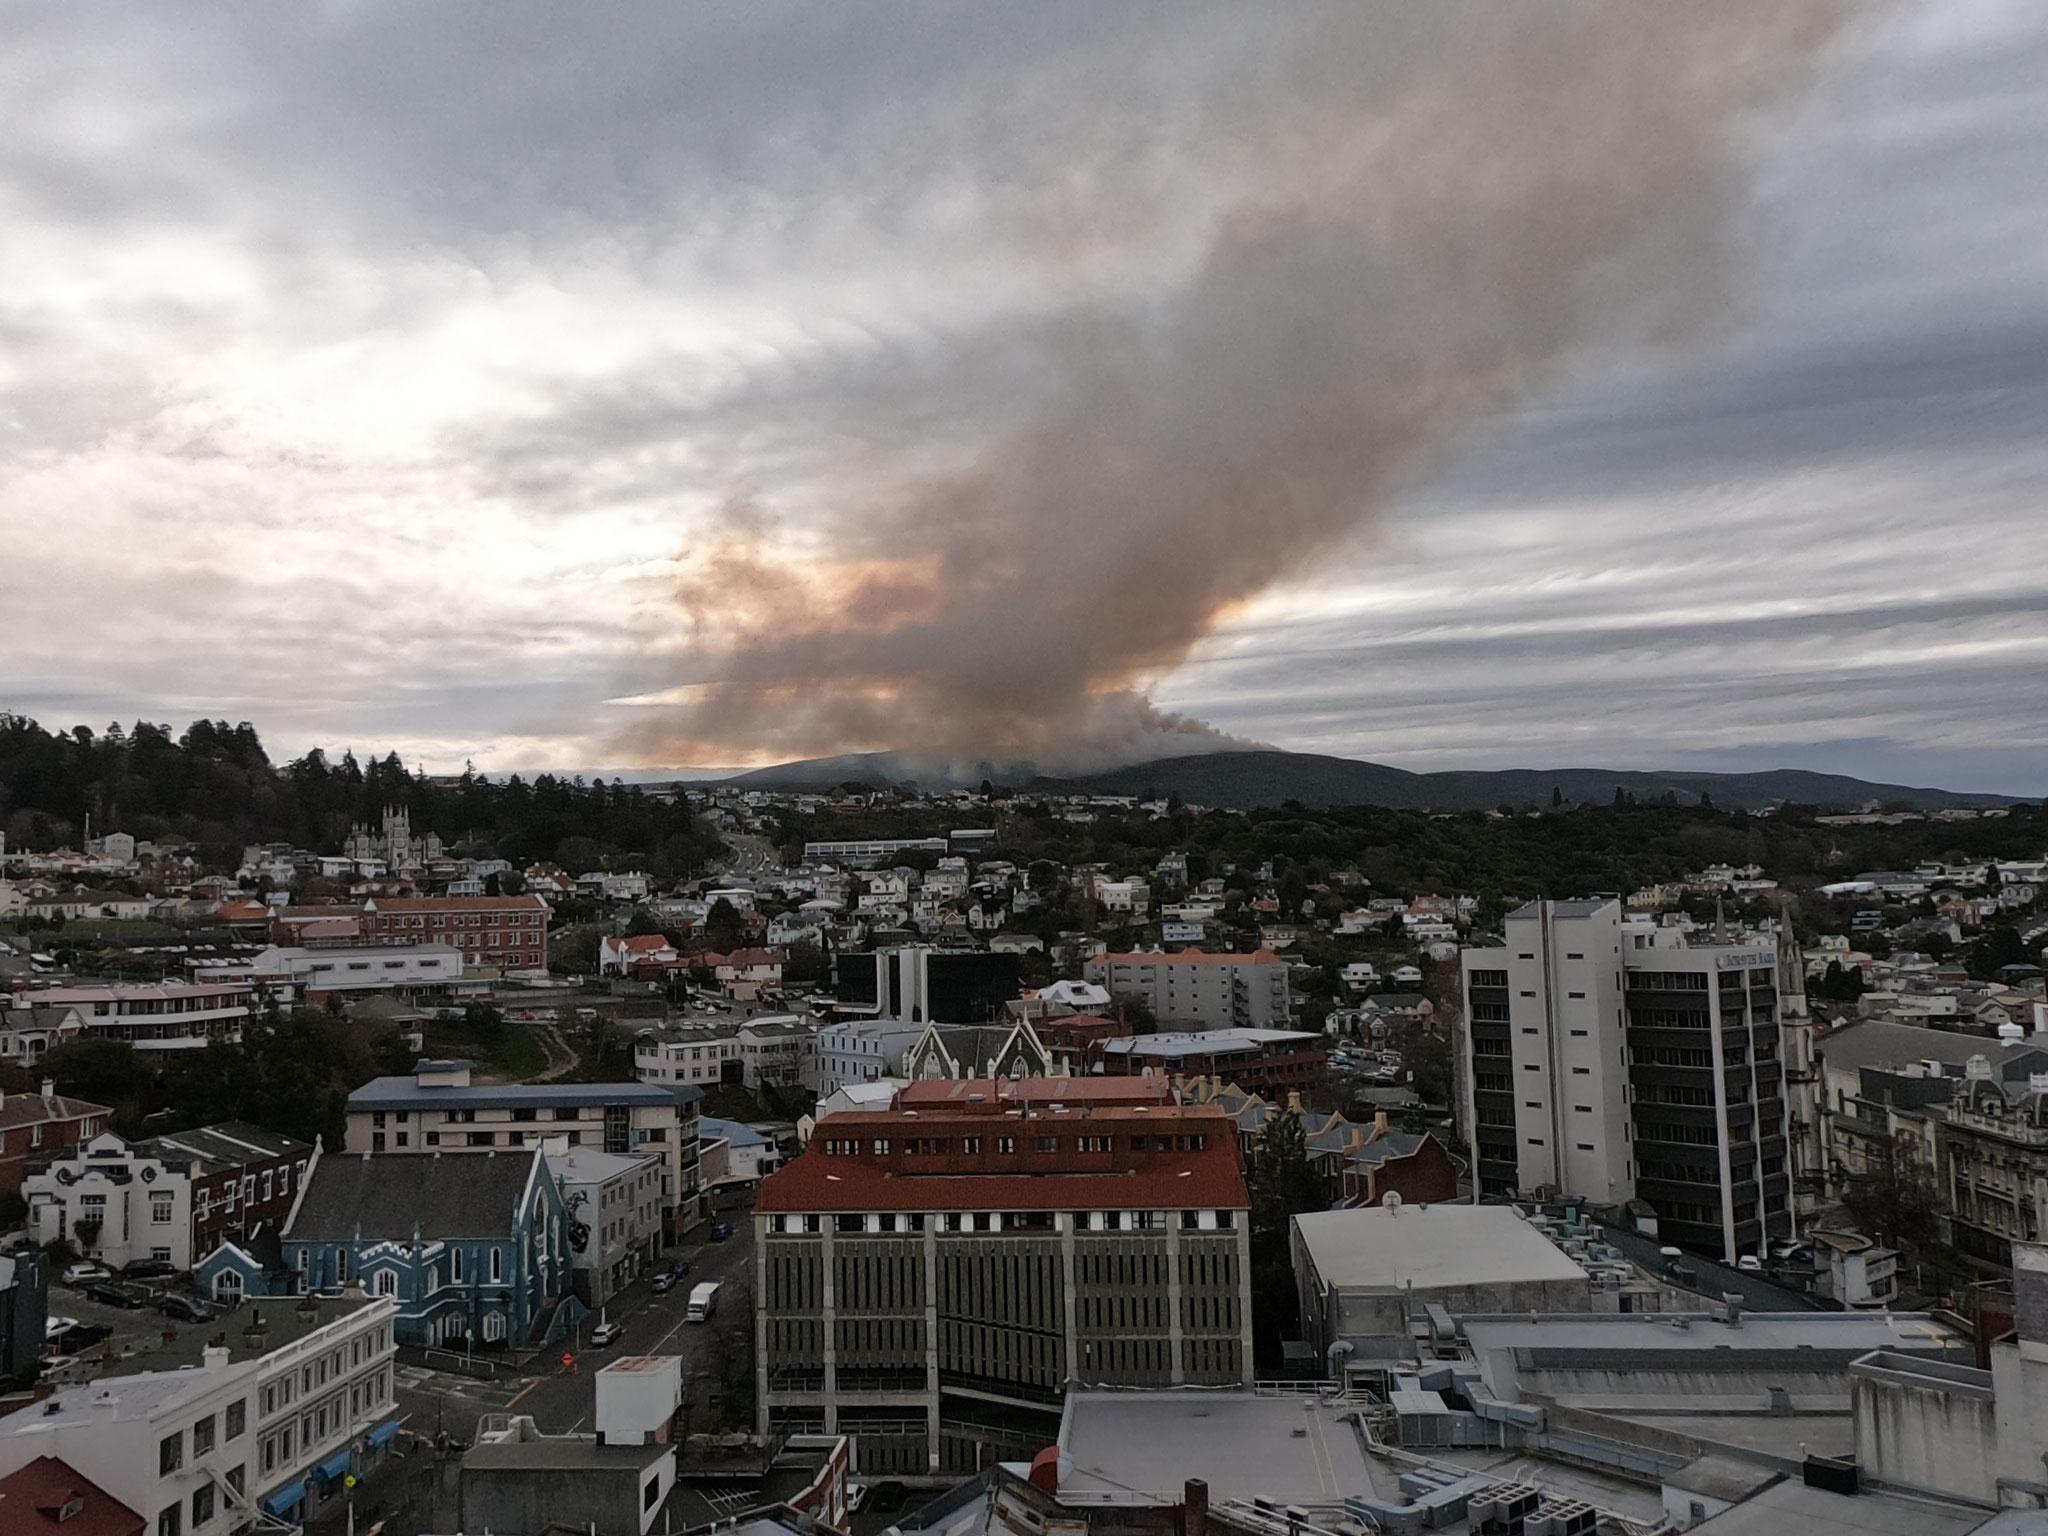 Flagstaff bush fire 16/09/19